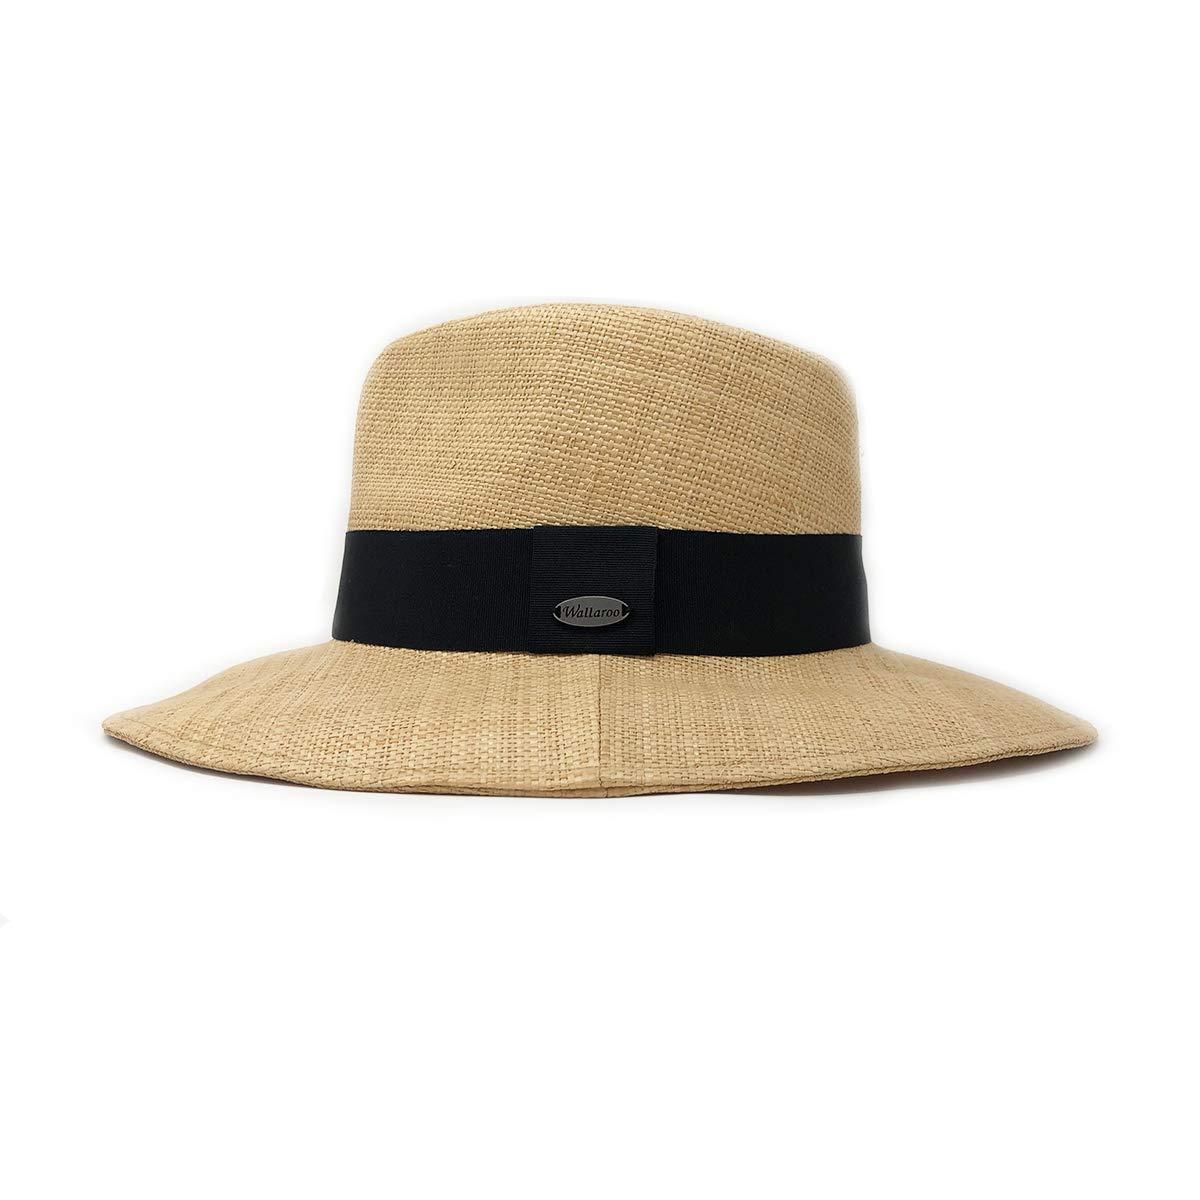 Wallaroo Hat Company Women's Morgan Fedora - Natural - UPF 50+, Modern Style by Wallaroo Hat Company (Image #2)